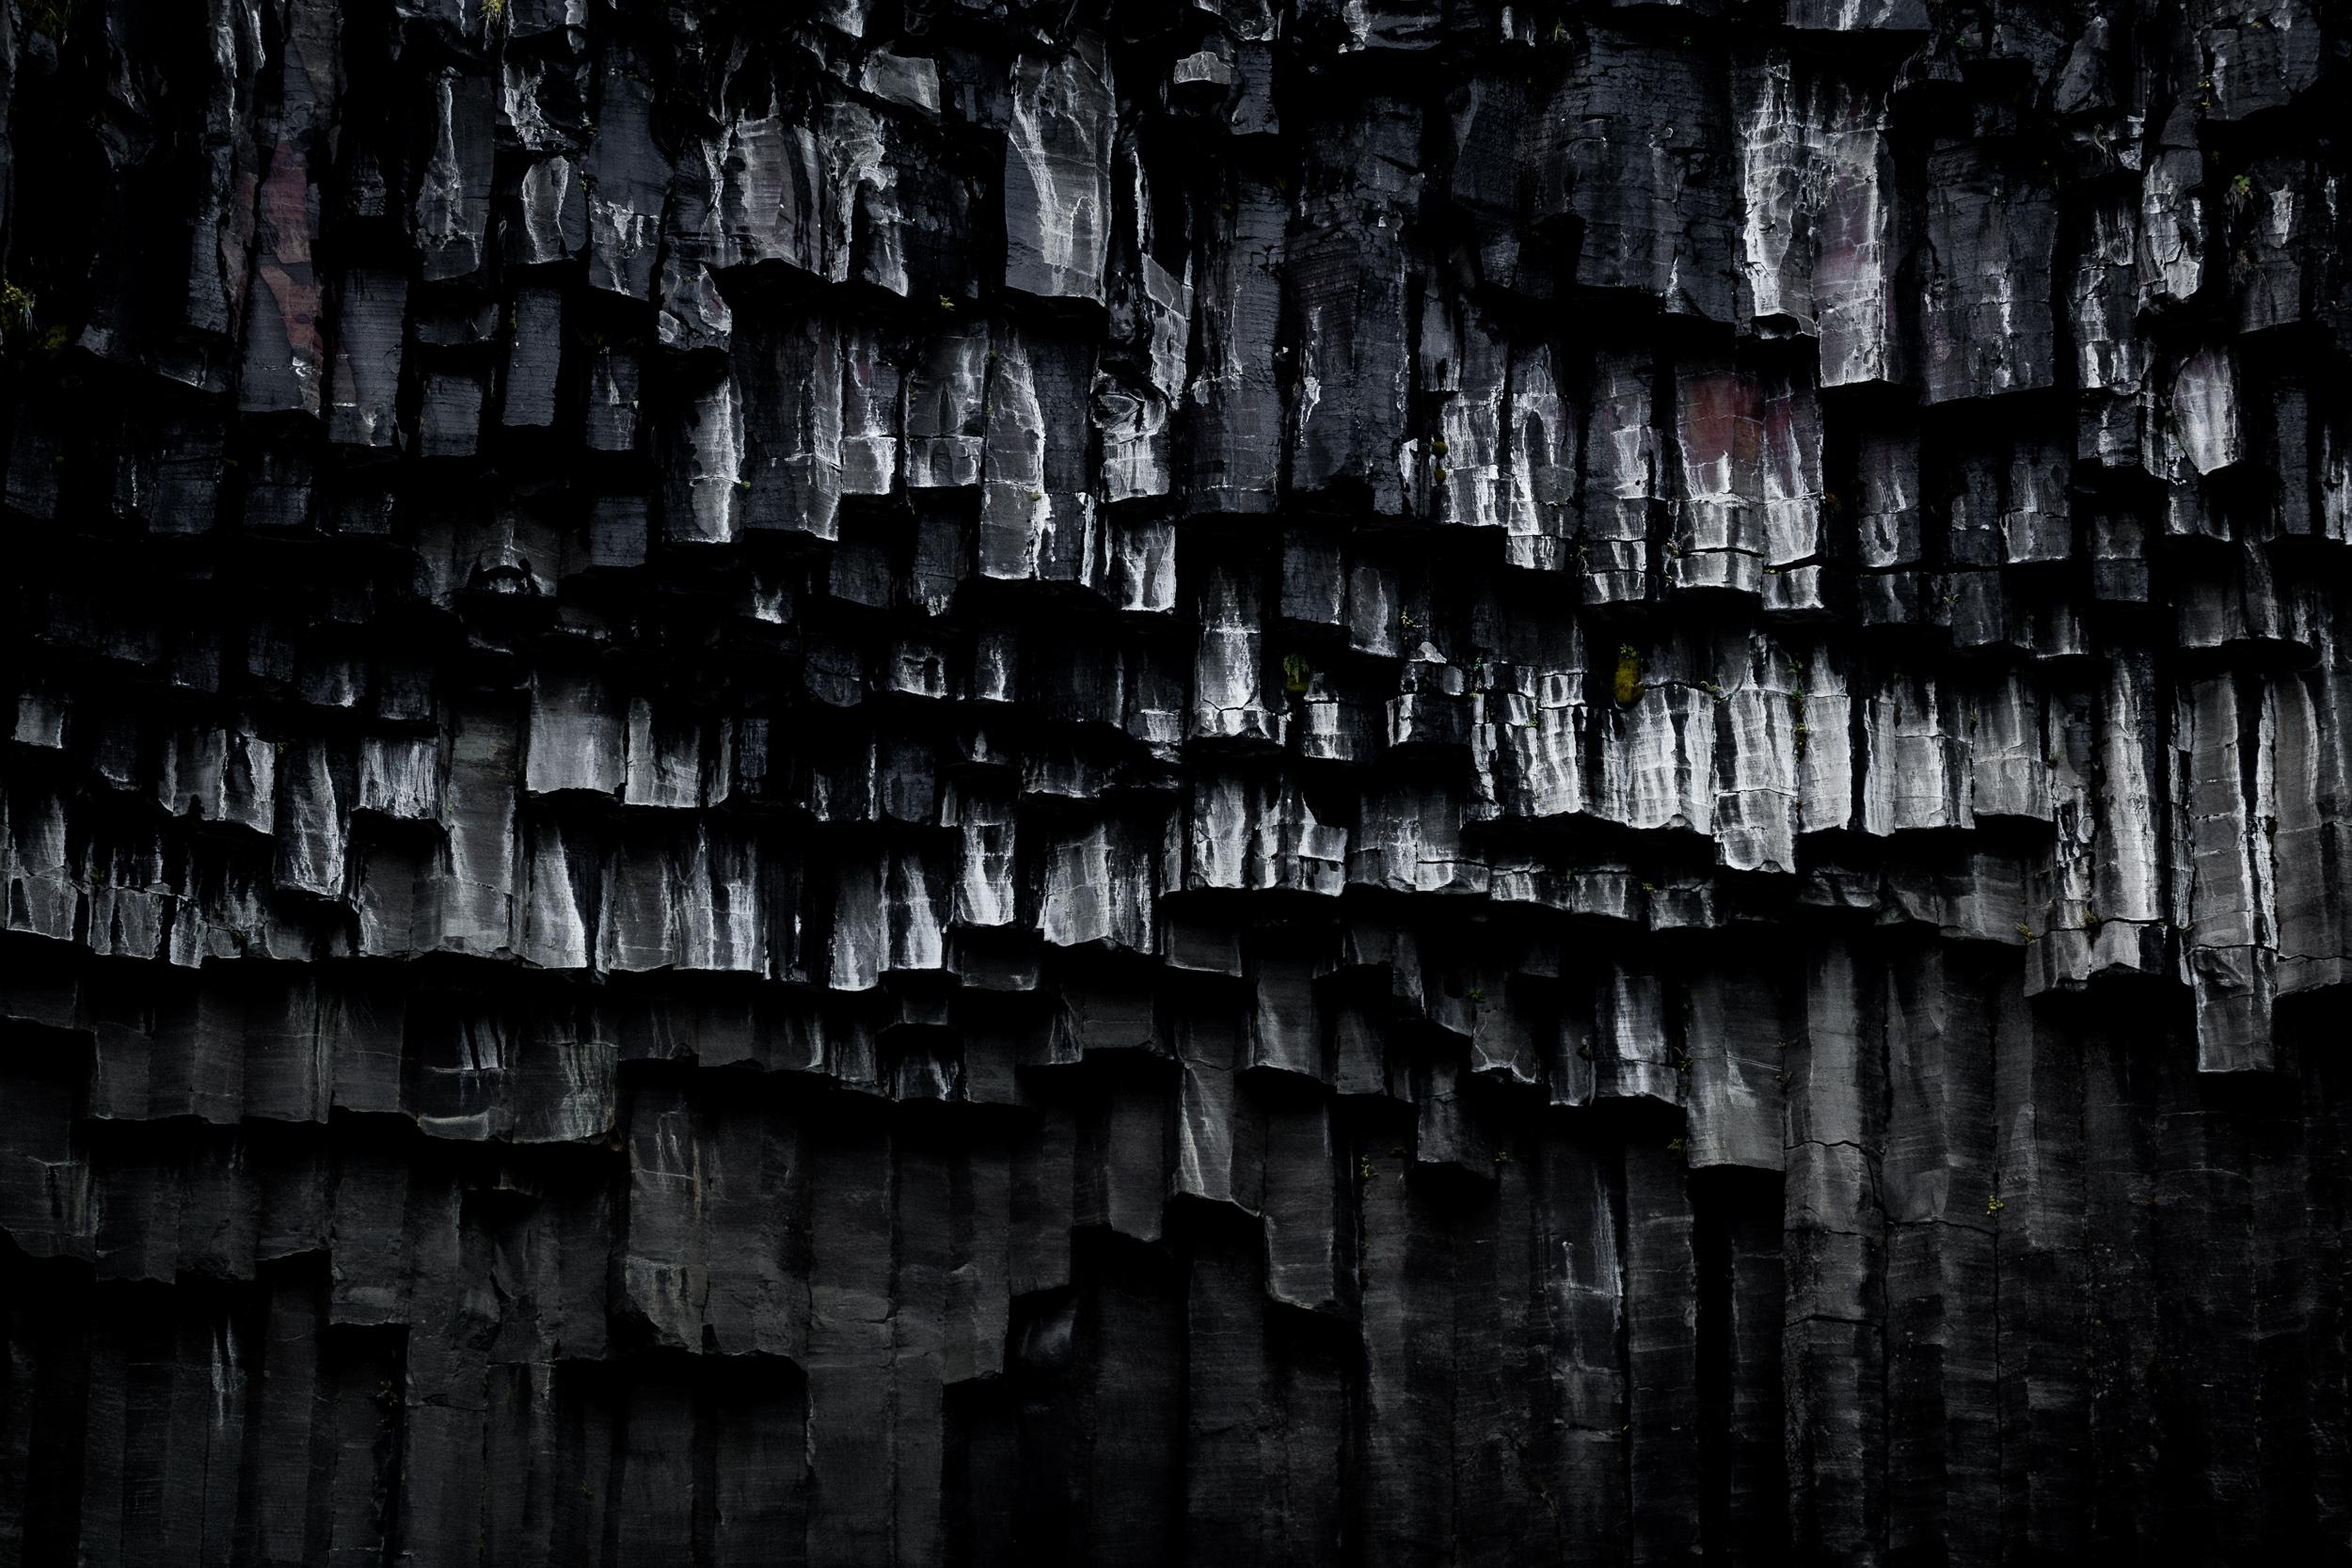 01-iceland-basalt-columns-svartifoss-anna-elina-lahti-photographer.jpg